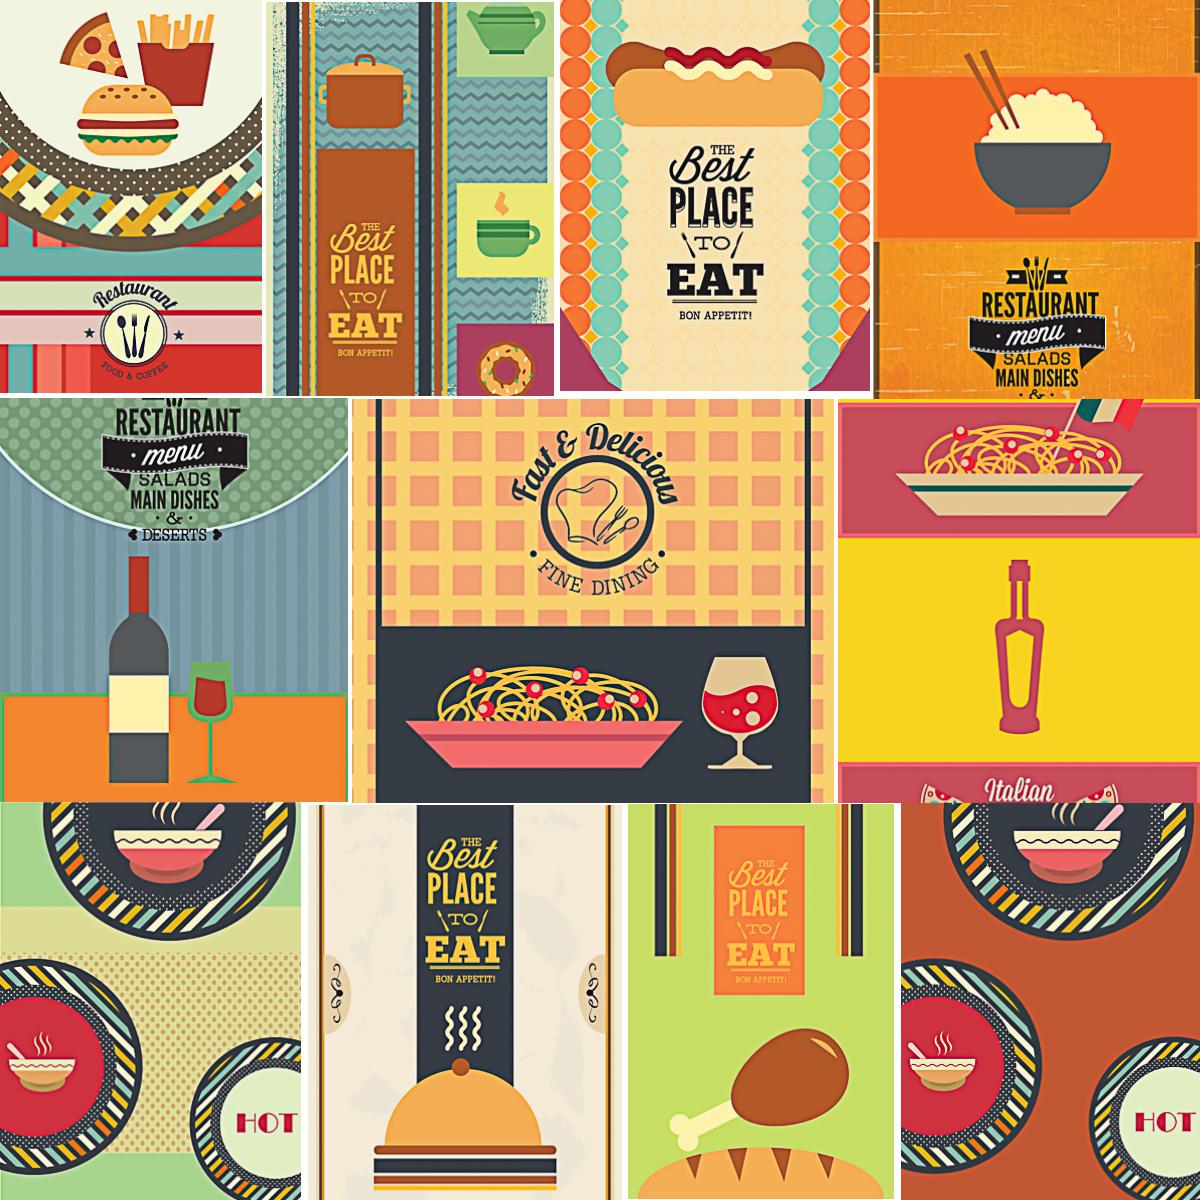 Doc626626 Food Menu Templates Free Restaurant menu template – Food Menu Templates Free